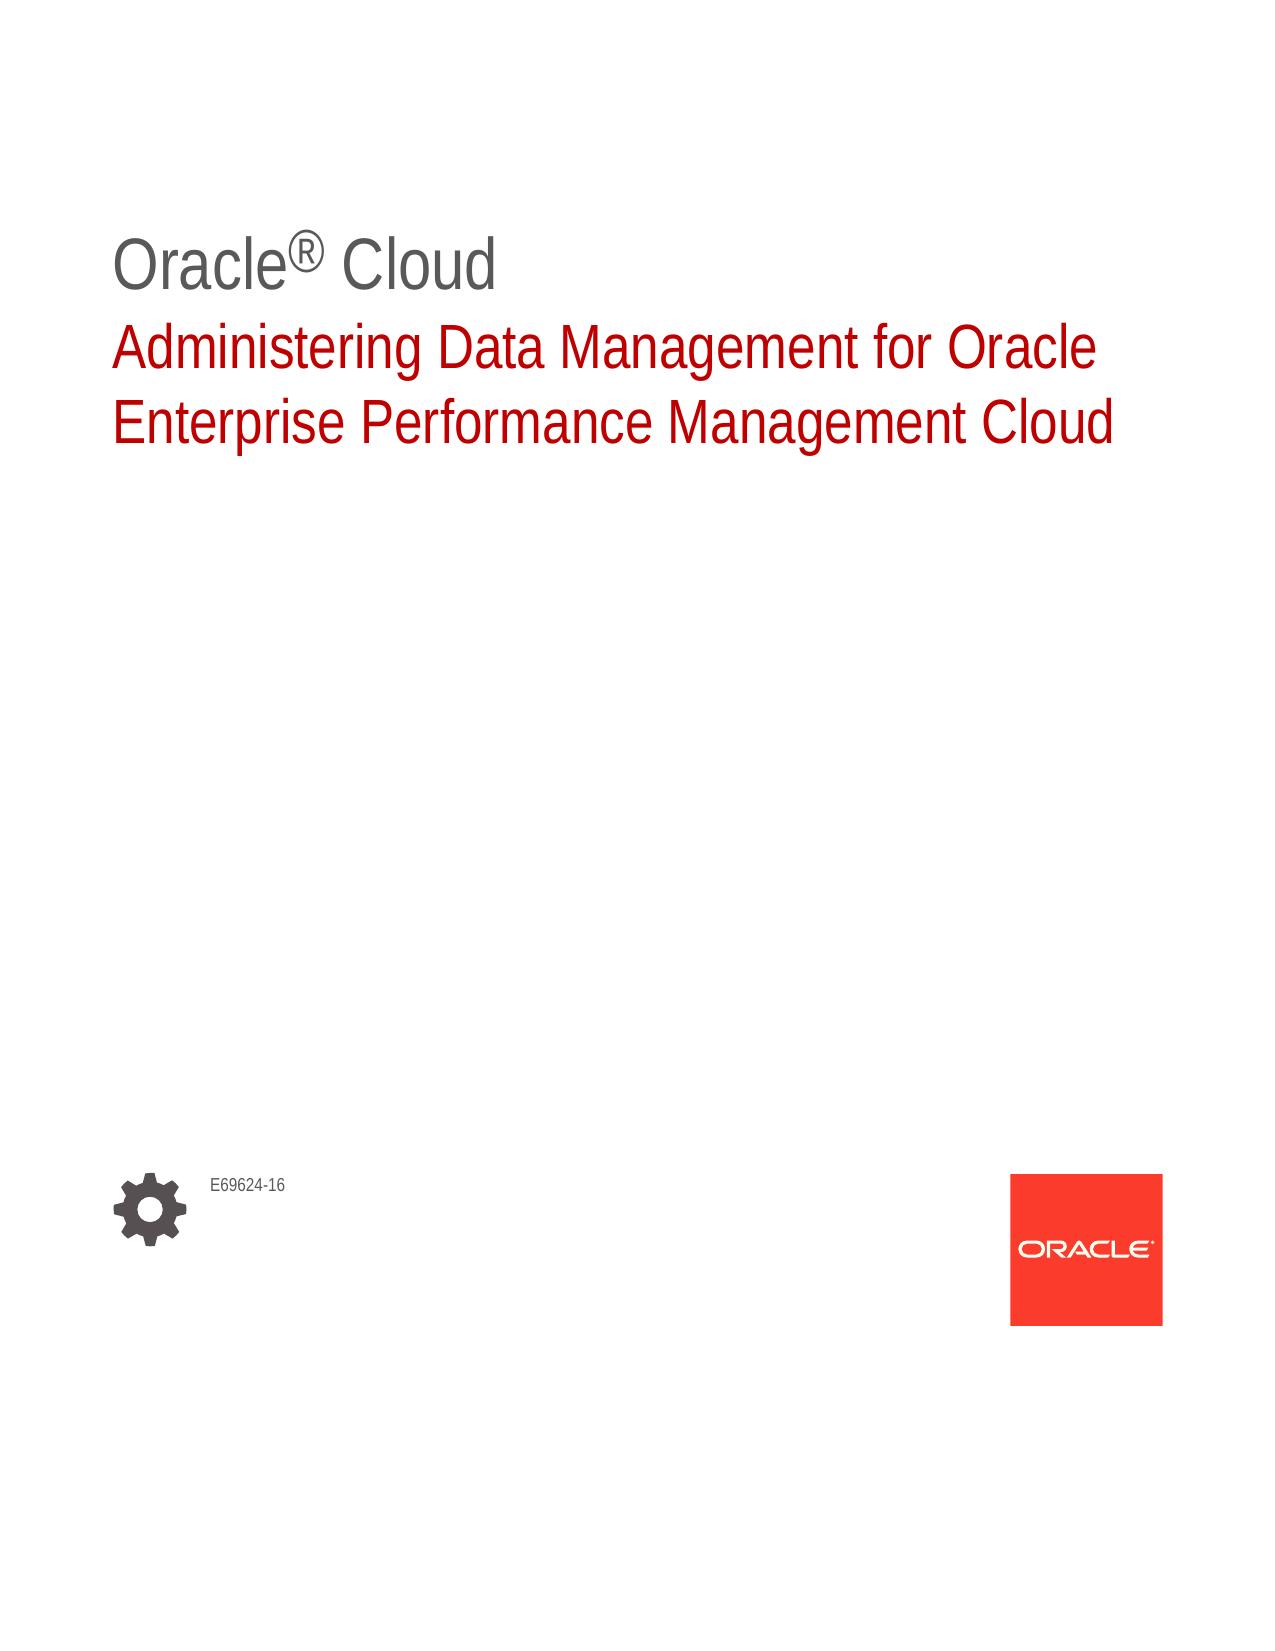 Administering Data Management for Oracle Enterprise